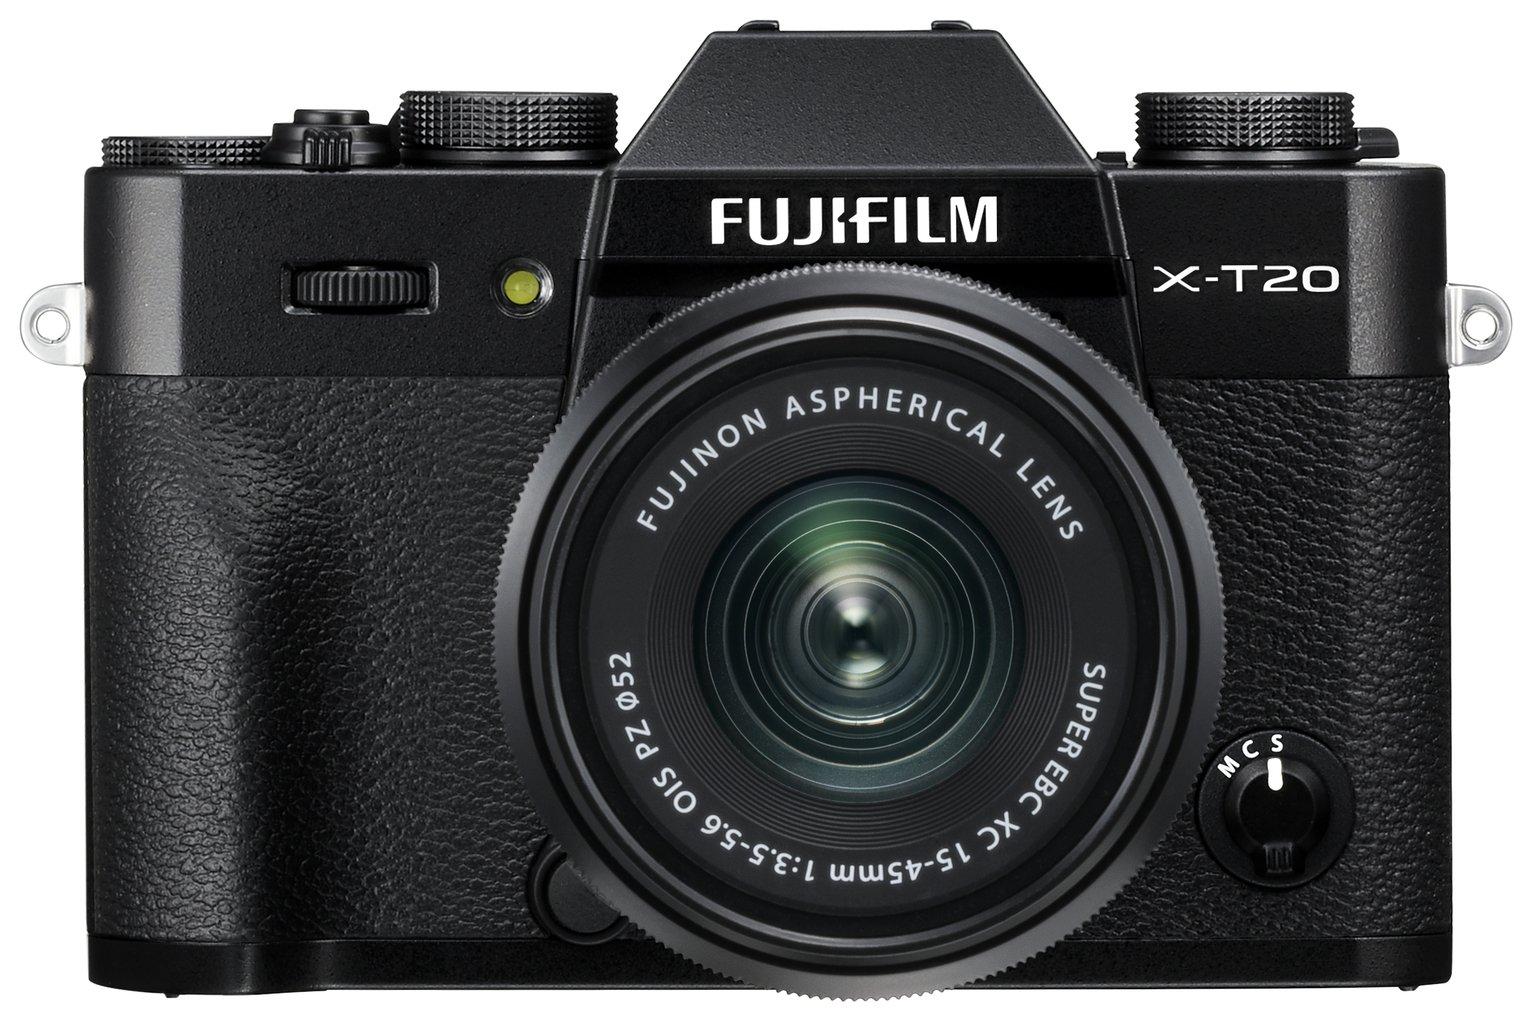 Fujifilm X-T20 Mirrorless Camera With 15-45mm Lens